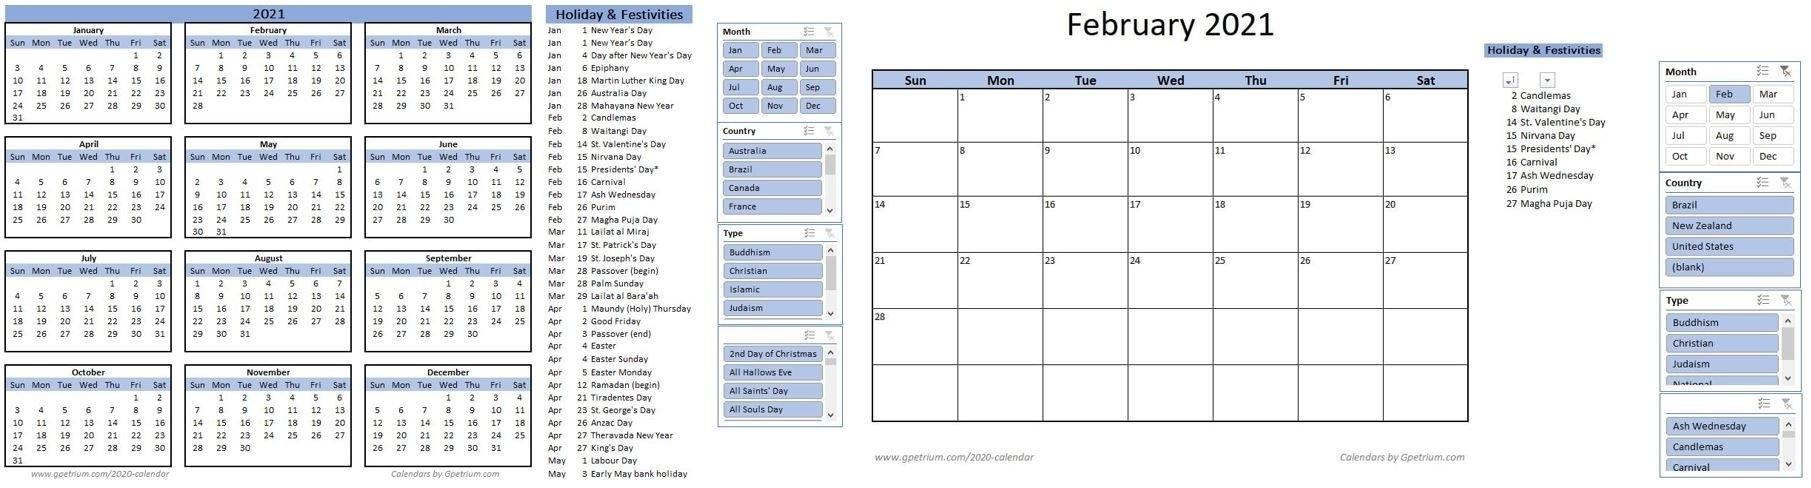 Free 2021 Calendar Template In Excel – Gpetrium